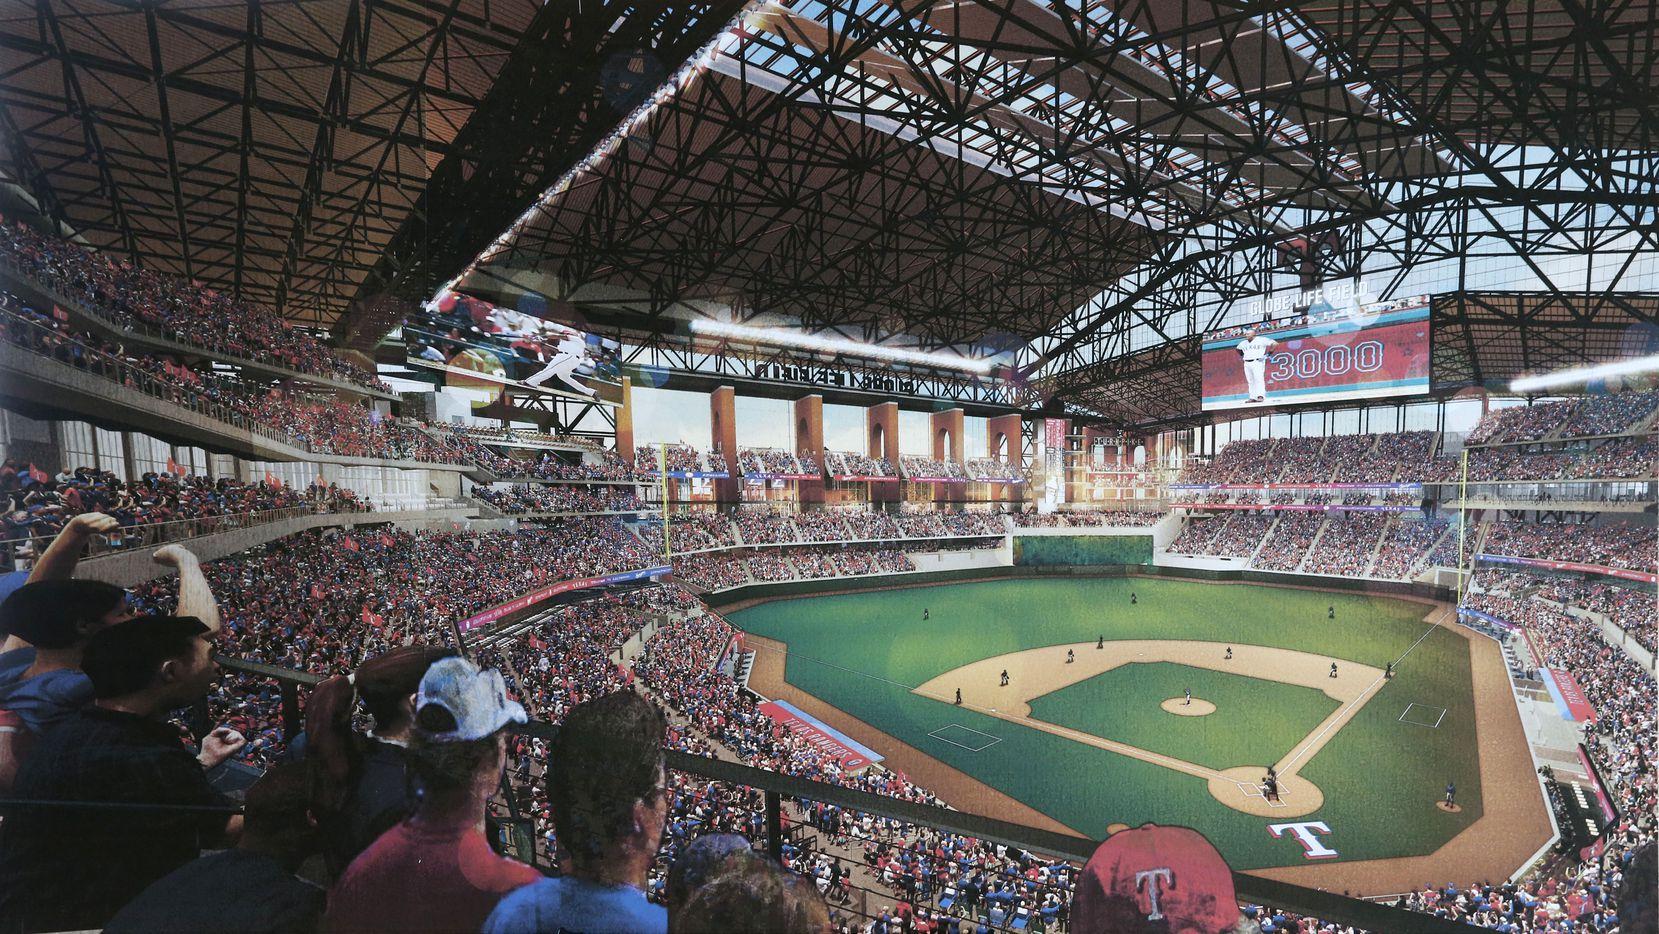 The interior of the ballpark